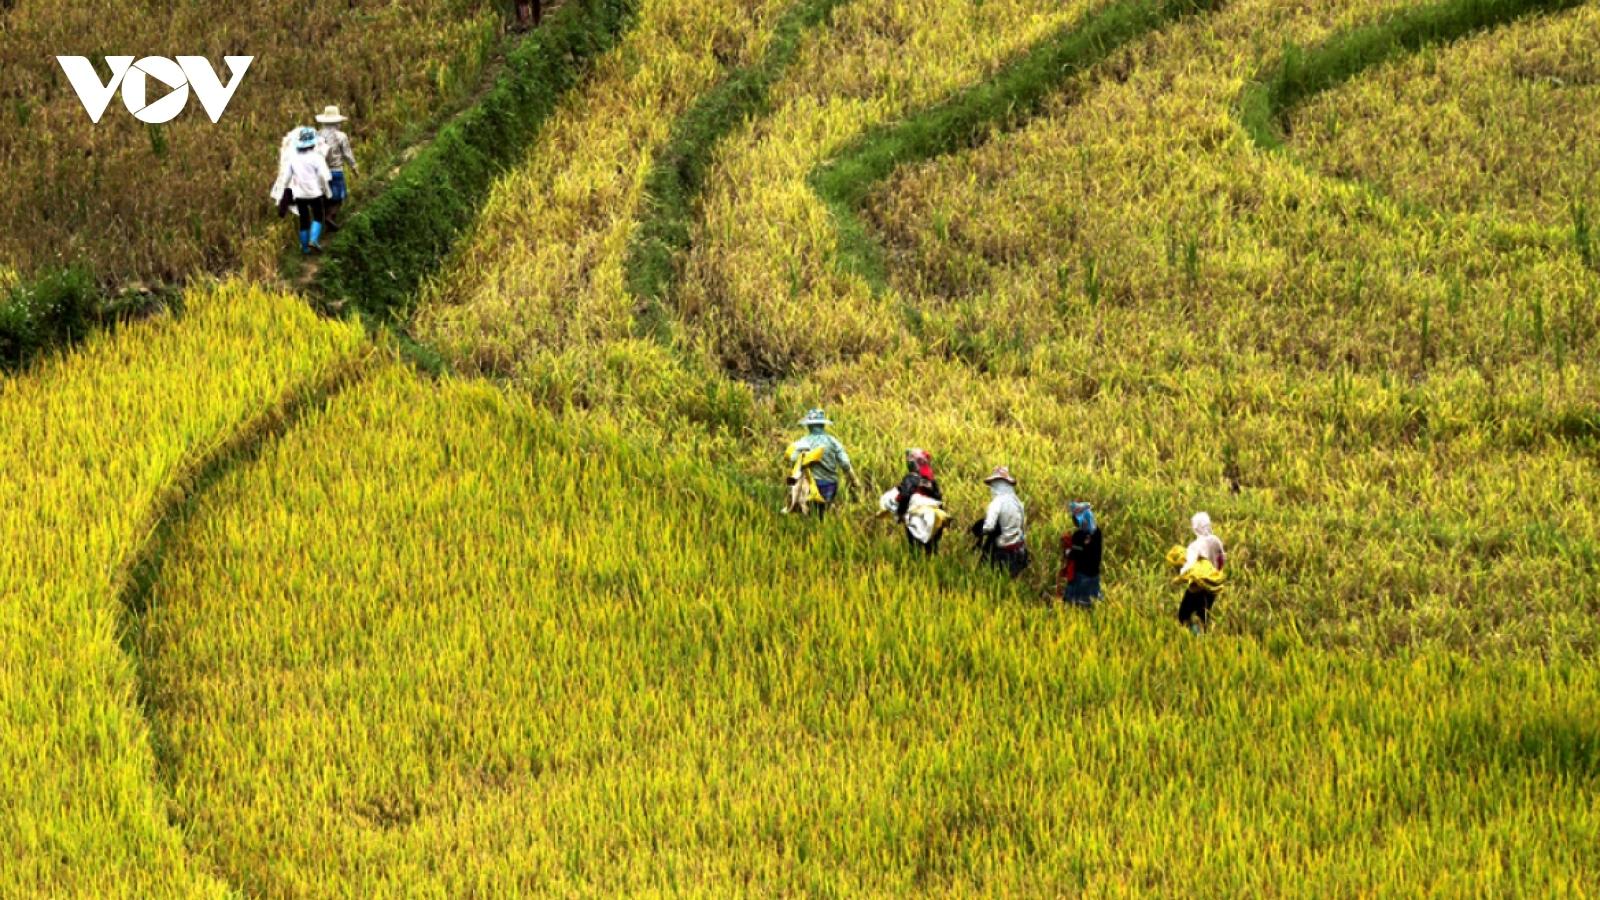 Rice harvest season begins in Ta Leng town